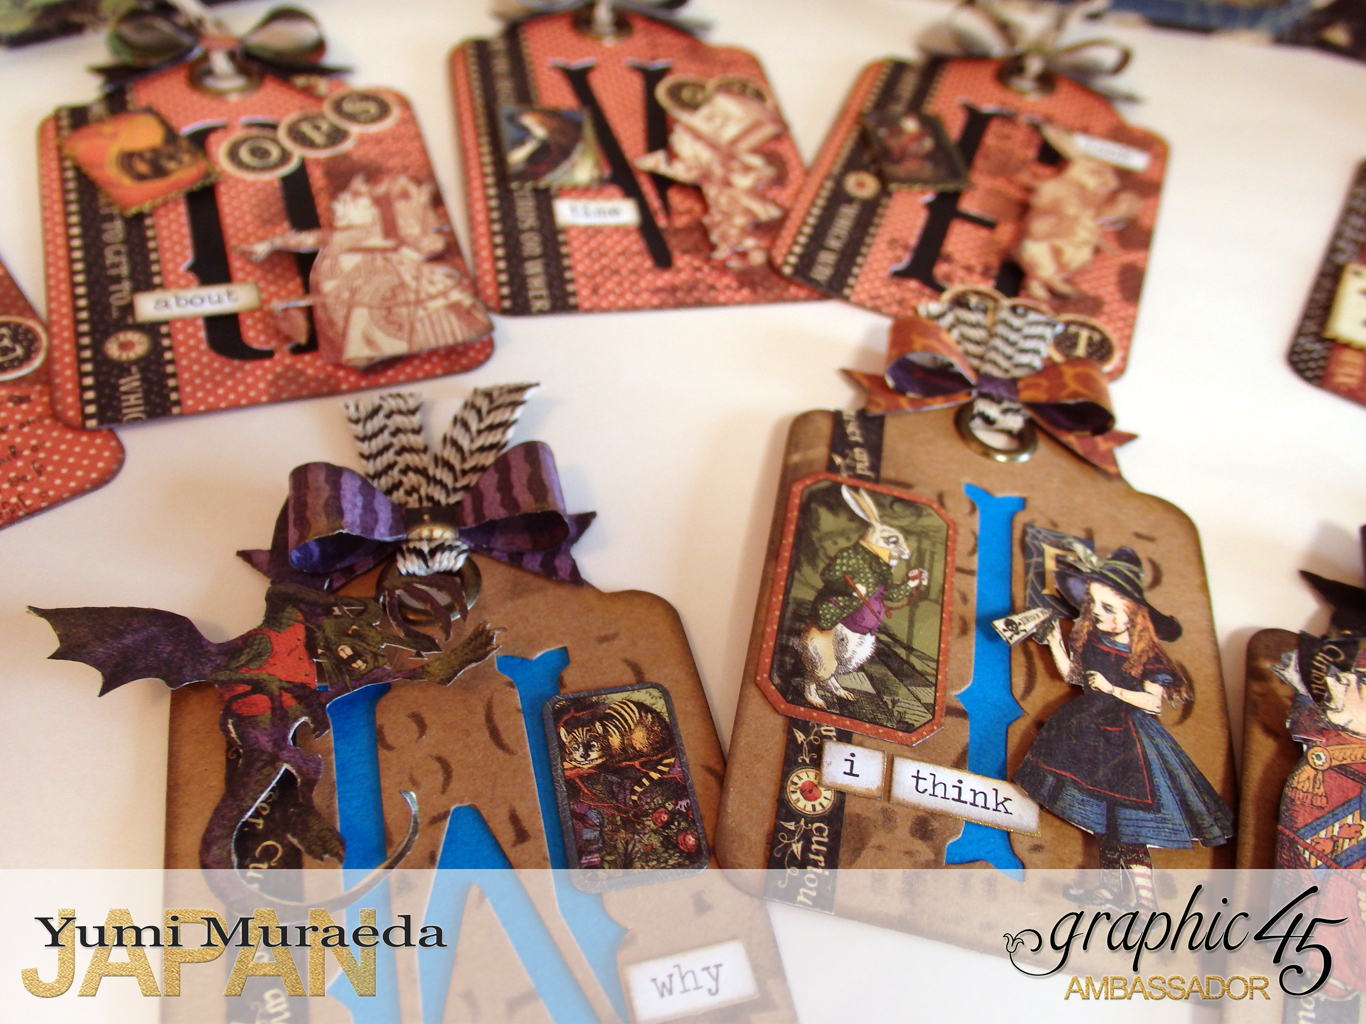 12ATC WonderlandHallowe'en in Wonderland by Yumi MuraeadaProduct by Graphic 45